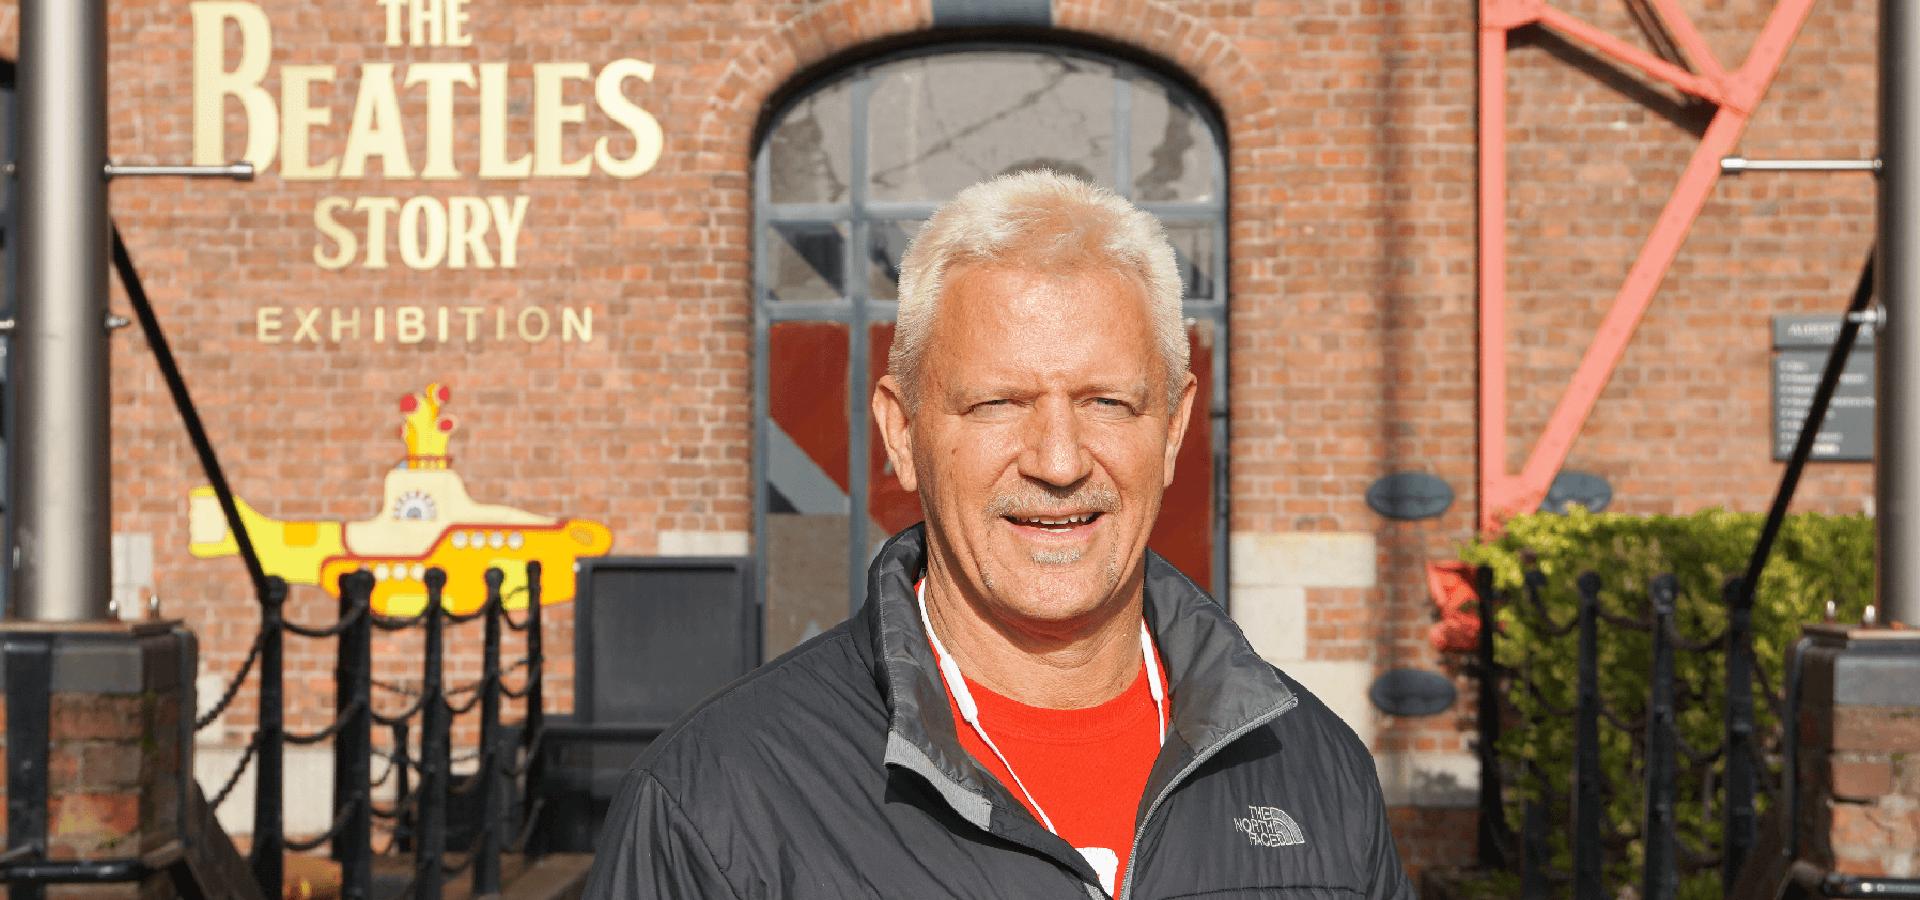 Jeff Jarrett: wrestling star visits The Beatles Story